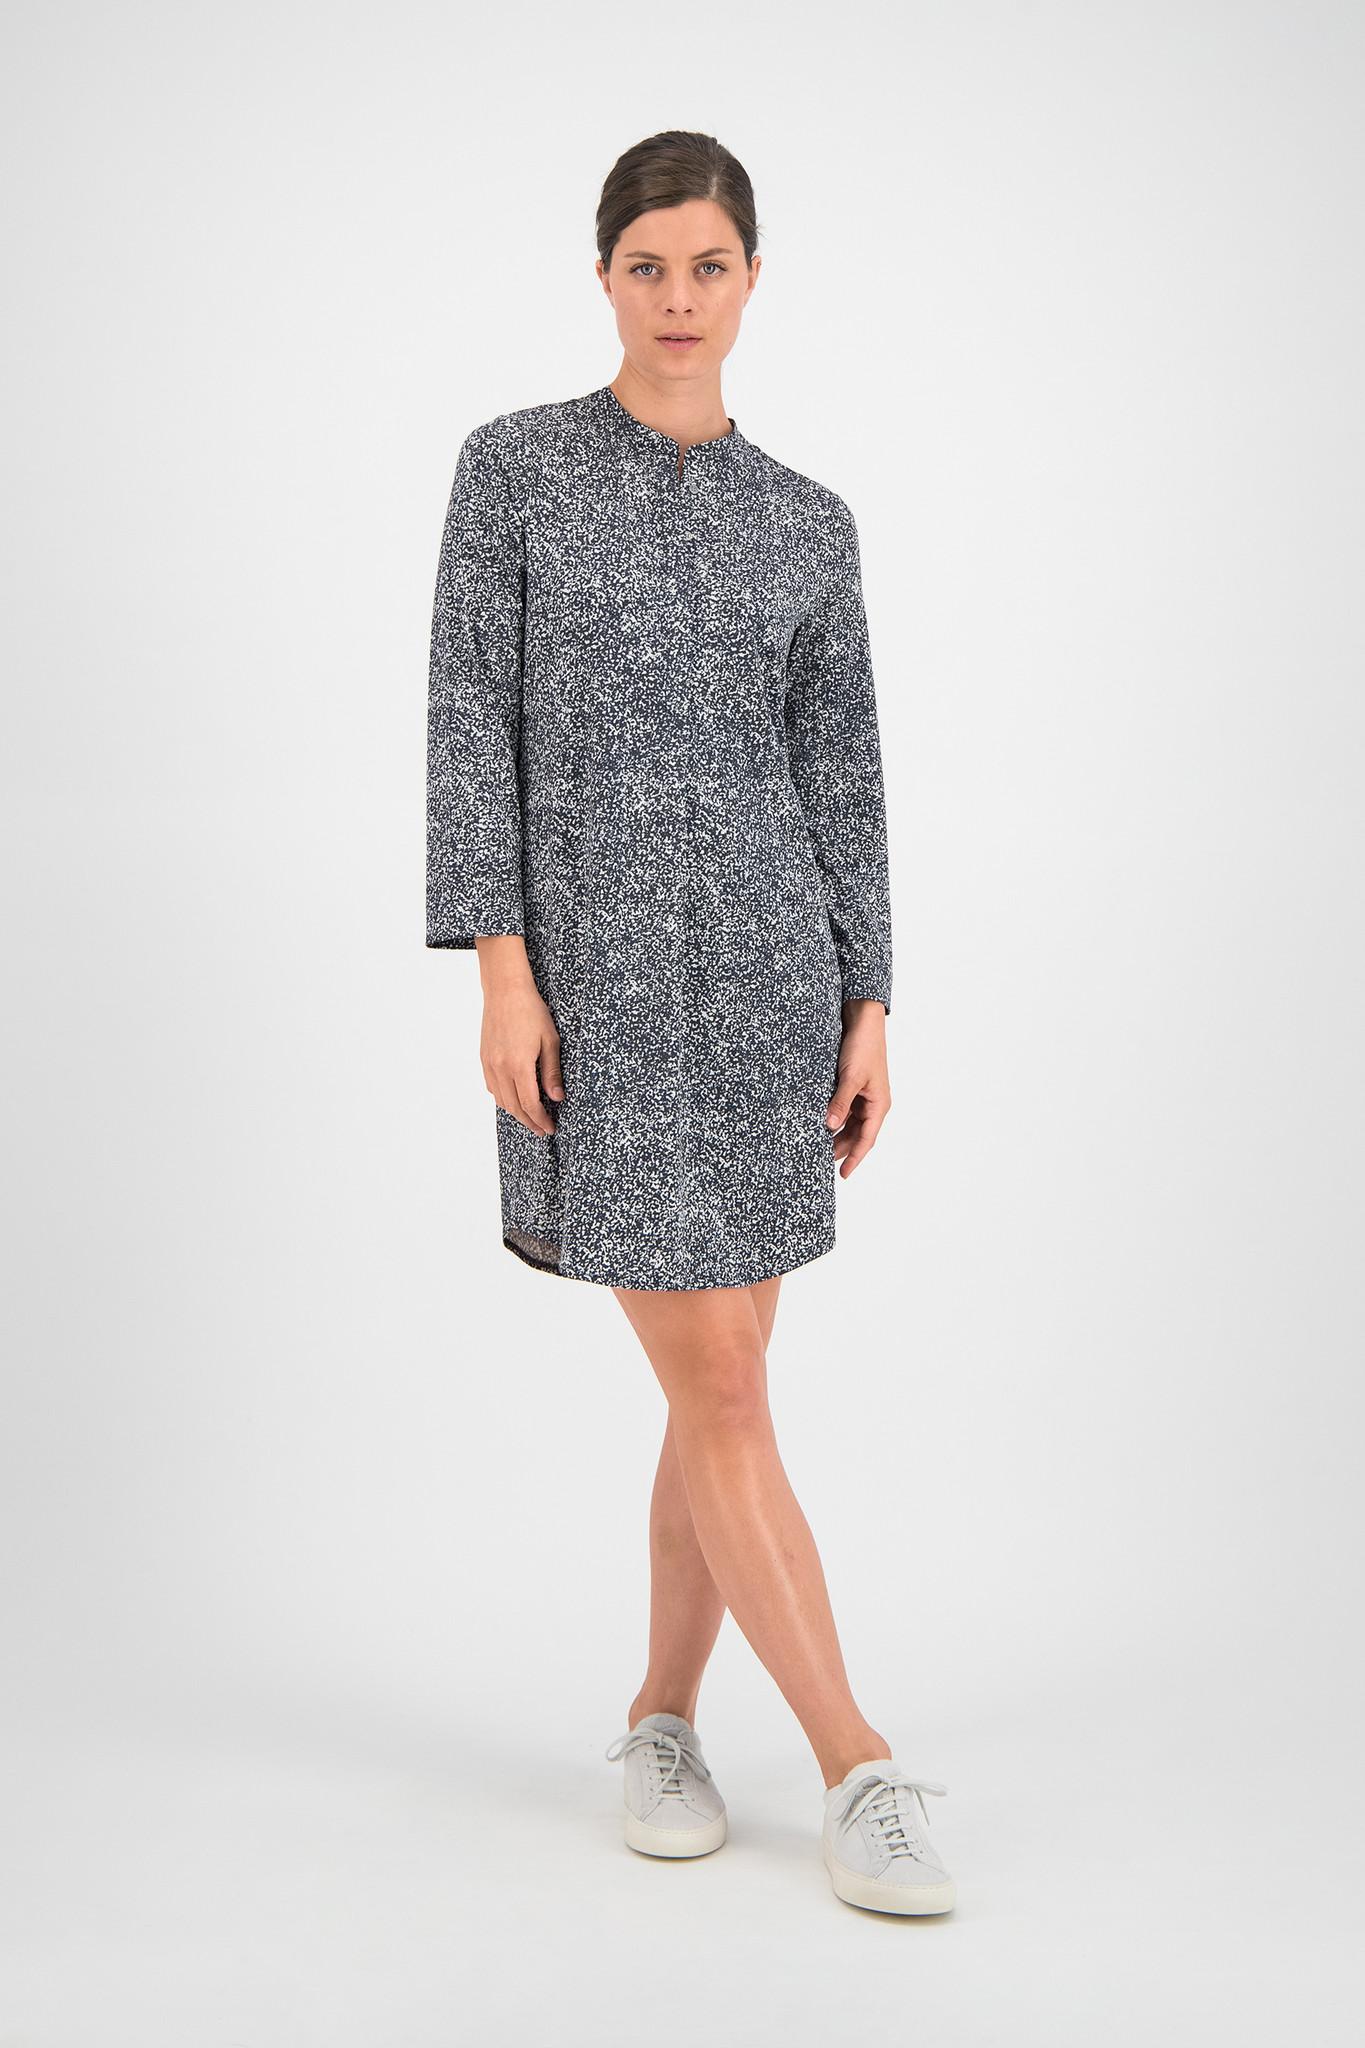 SYLVER Gravel Silky Jersey Dress - Grey